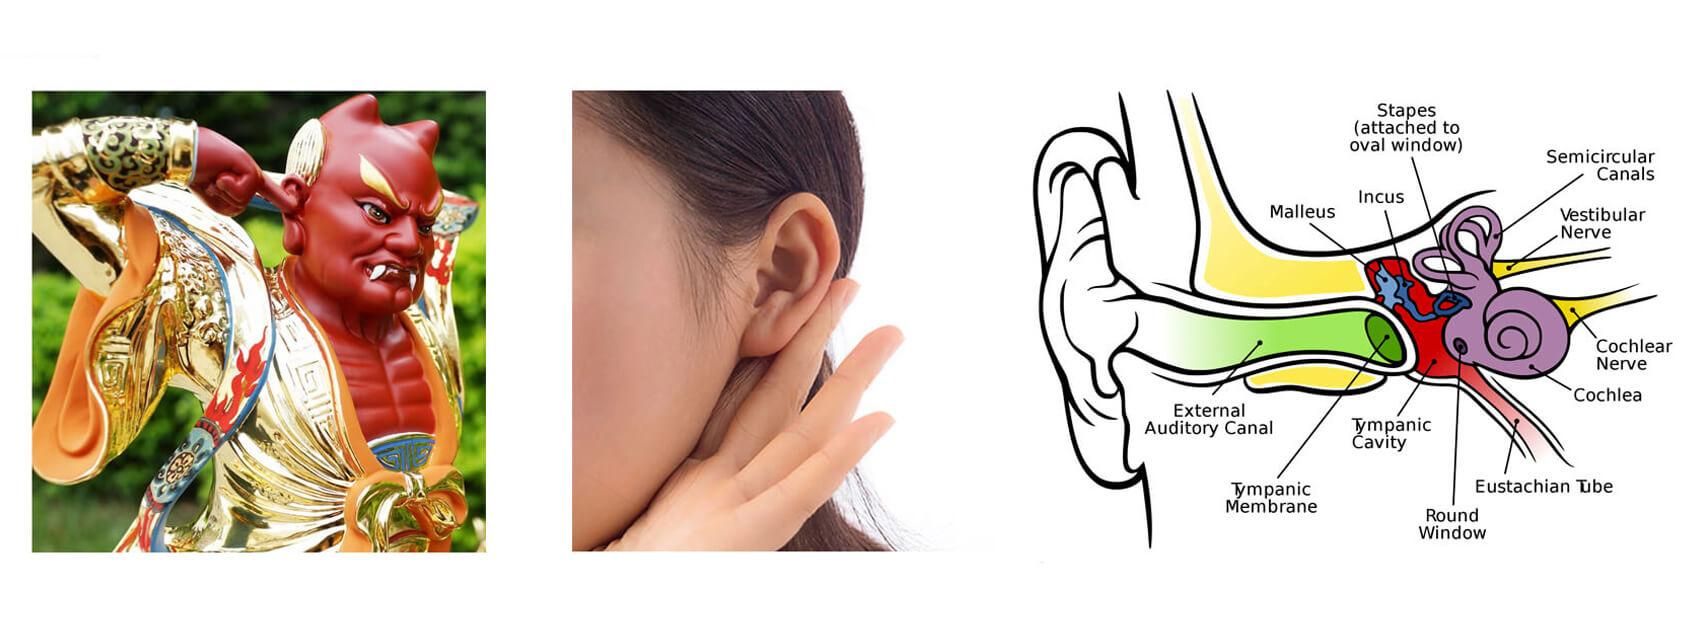 Cochlea-Implantat-Magnete-1